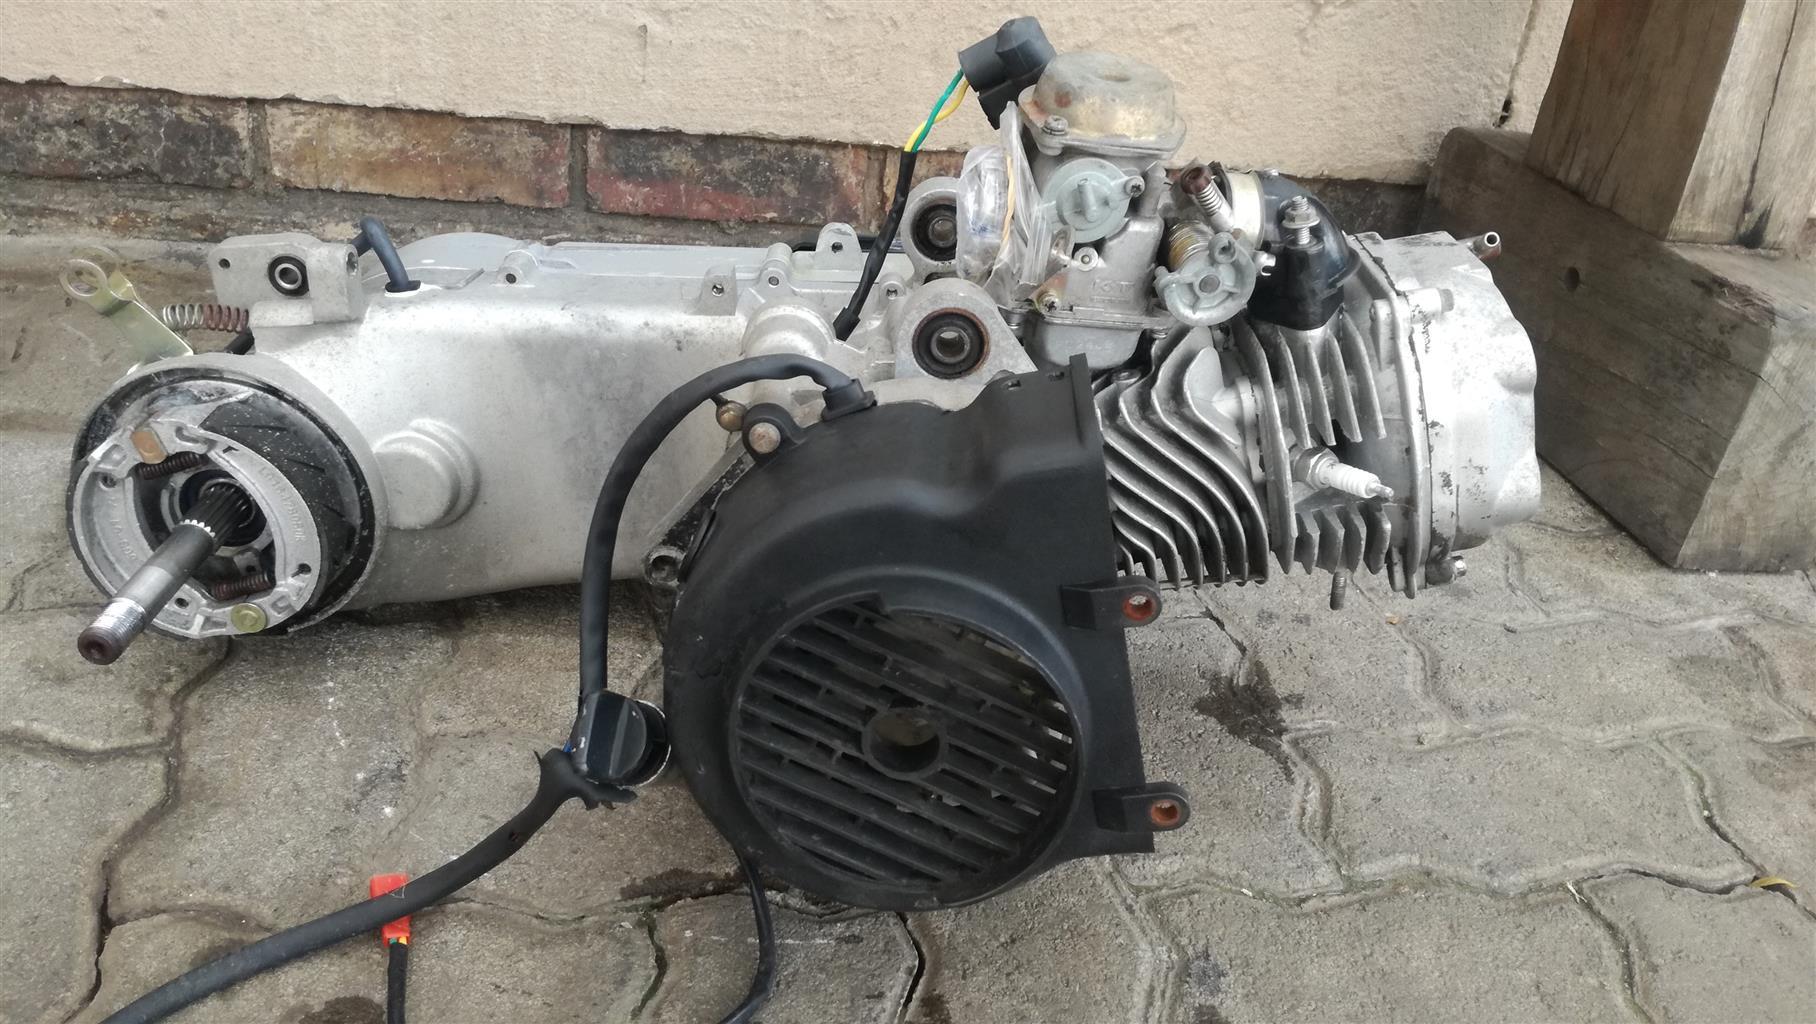 Vuka 125cc motor and clutch